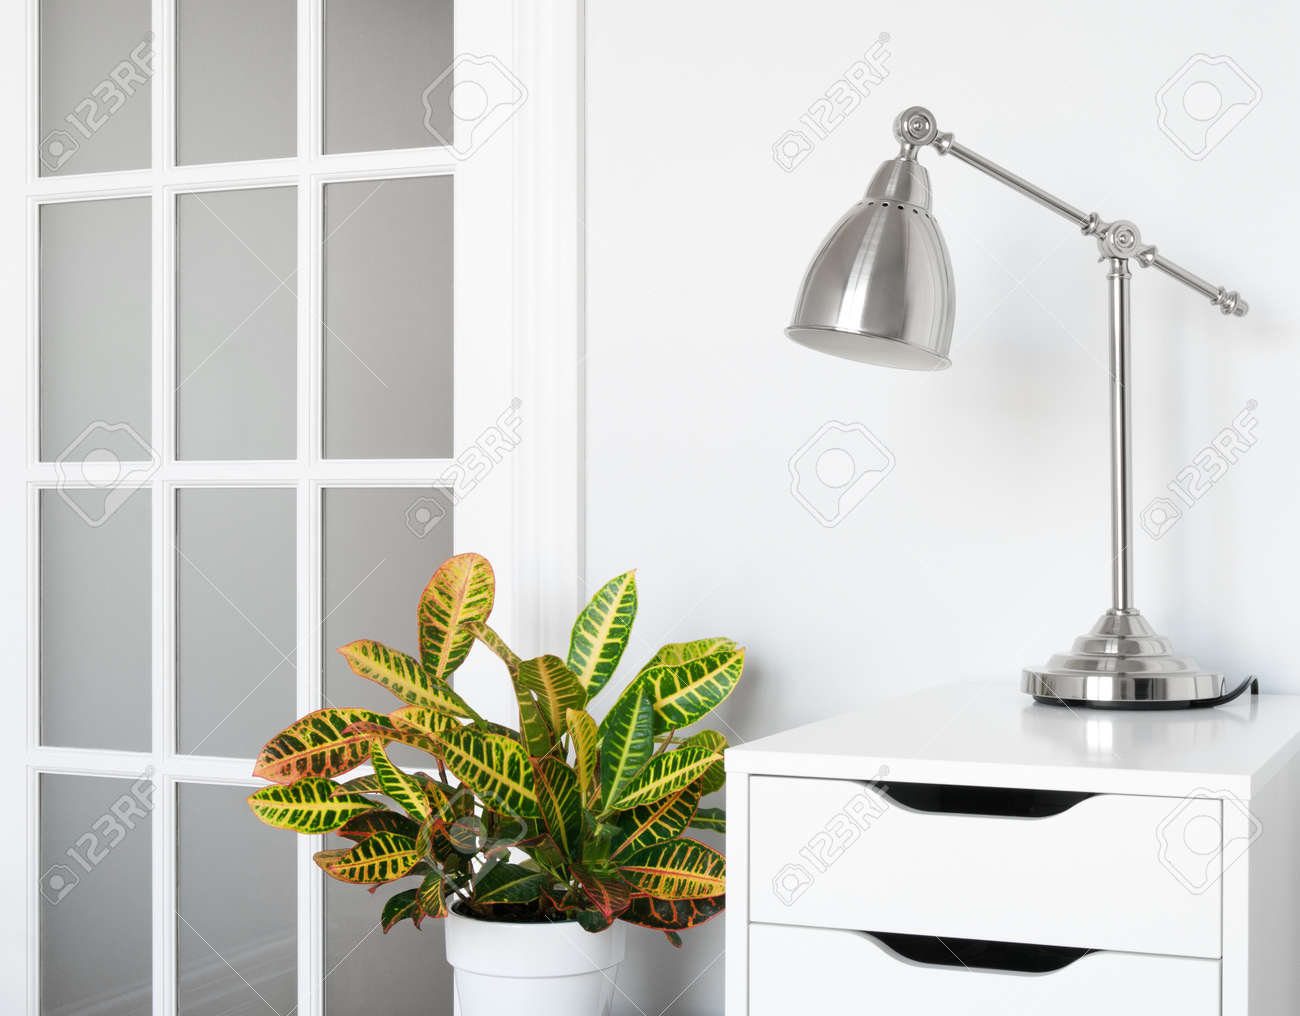 Modern room decor  Green plant, stylish furniture and lighting Stock Photo - 15866585